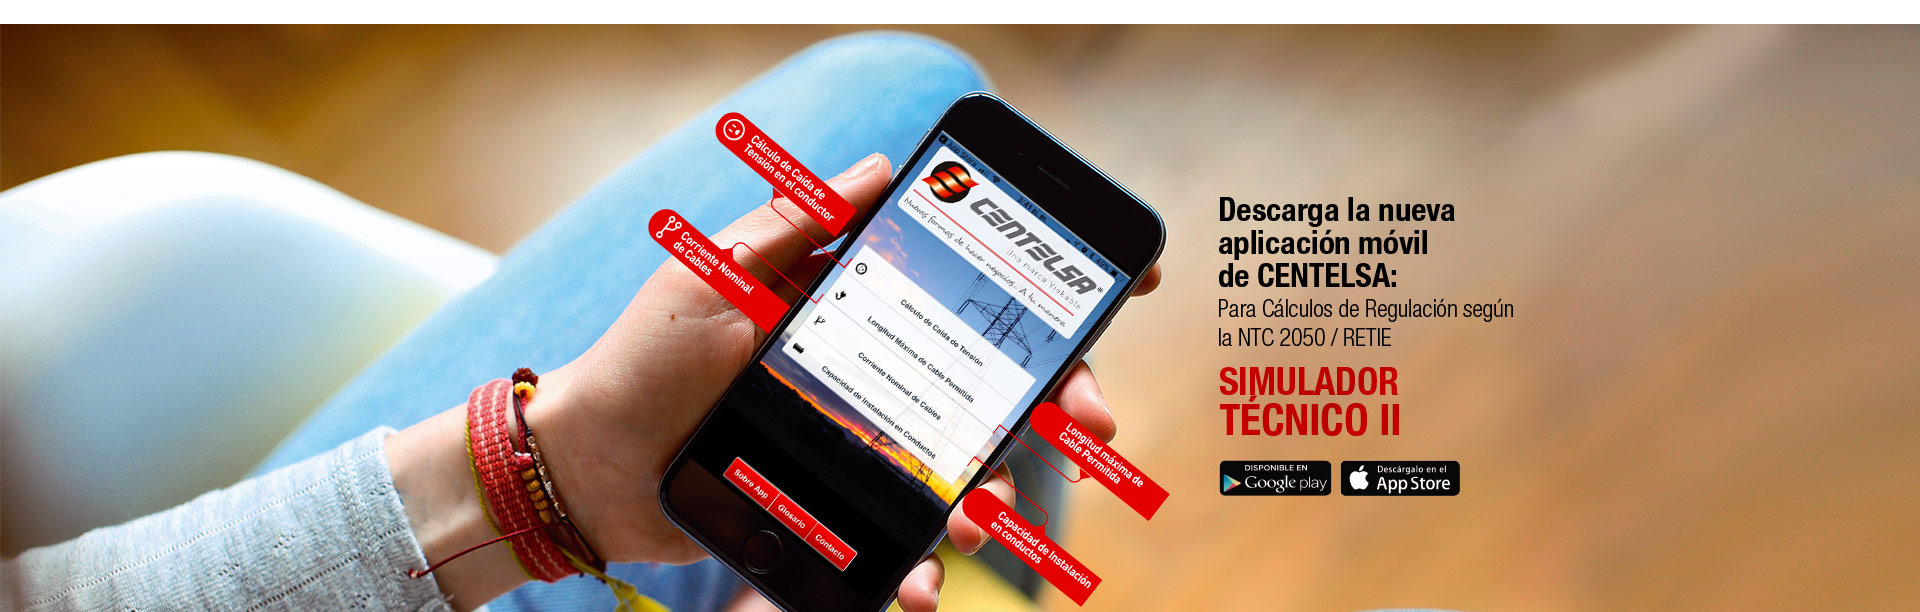 centelsa app - colombia, perú, ecuador